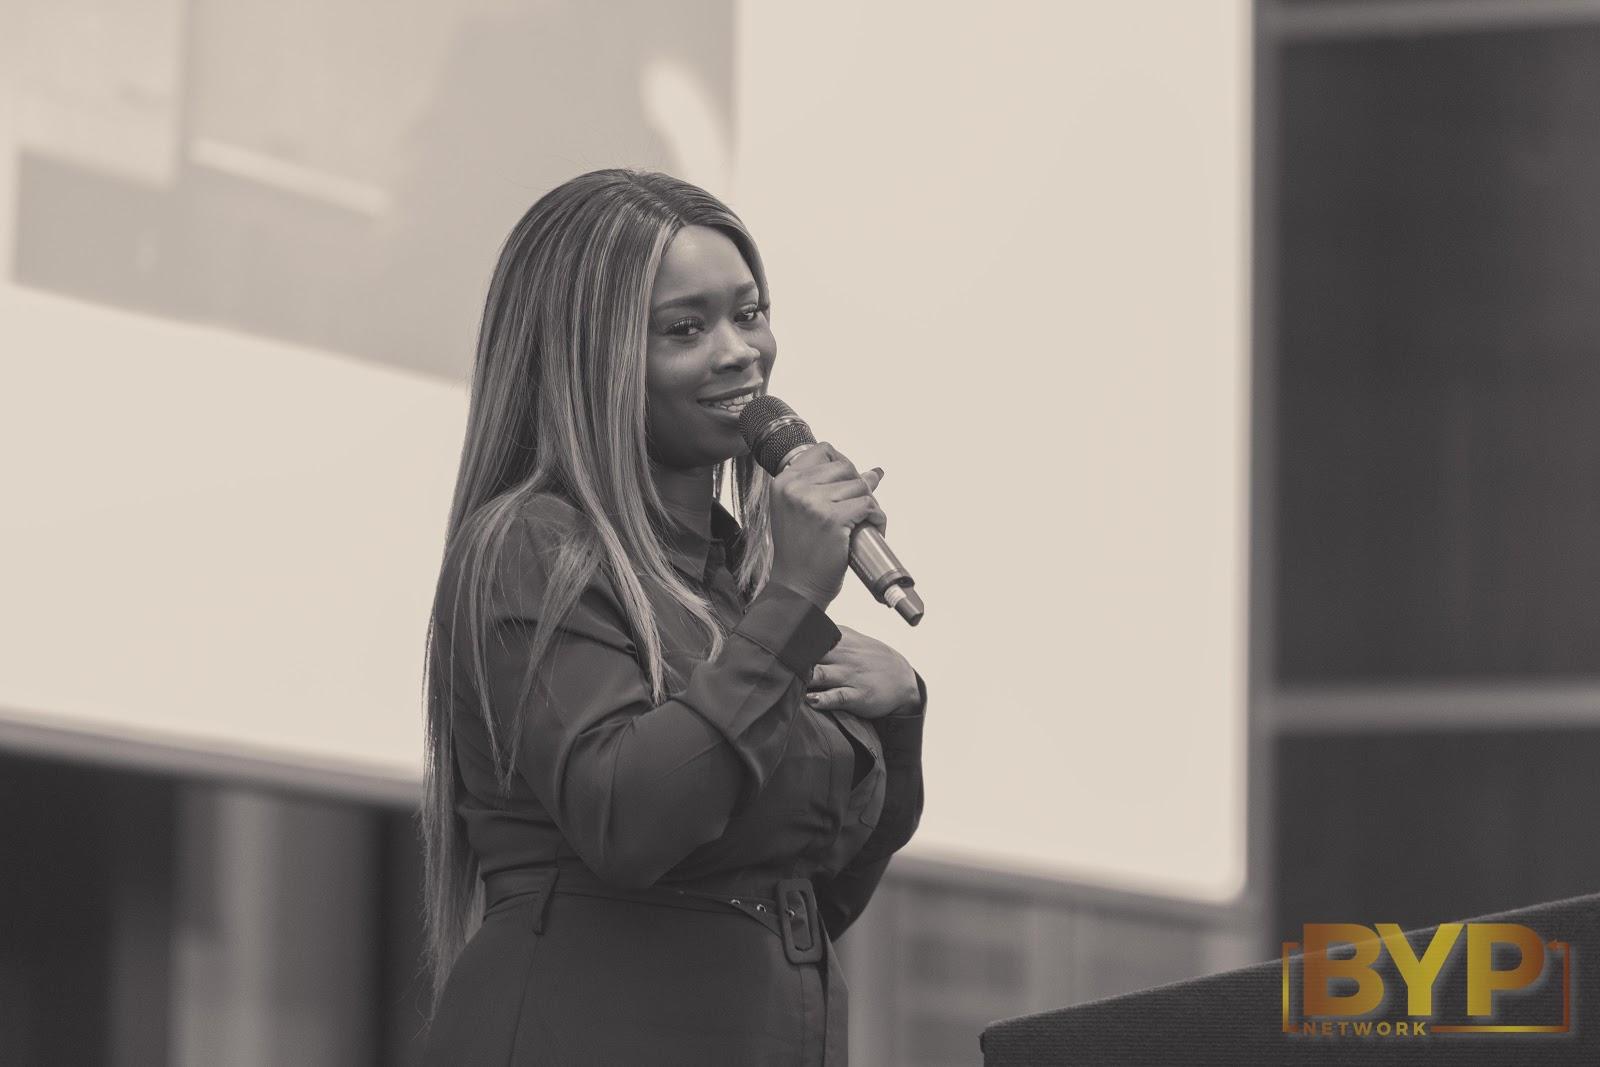 BYP Network founder, Kiki Oninwinde talks on stage.